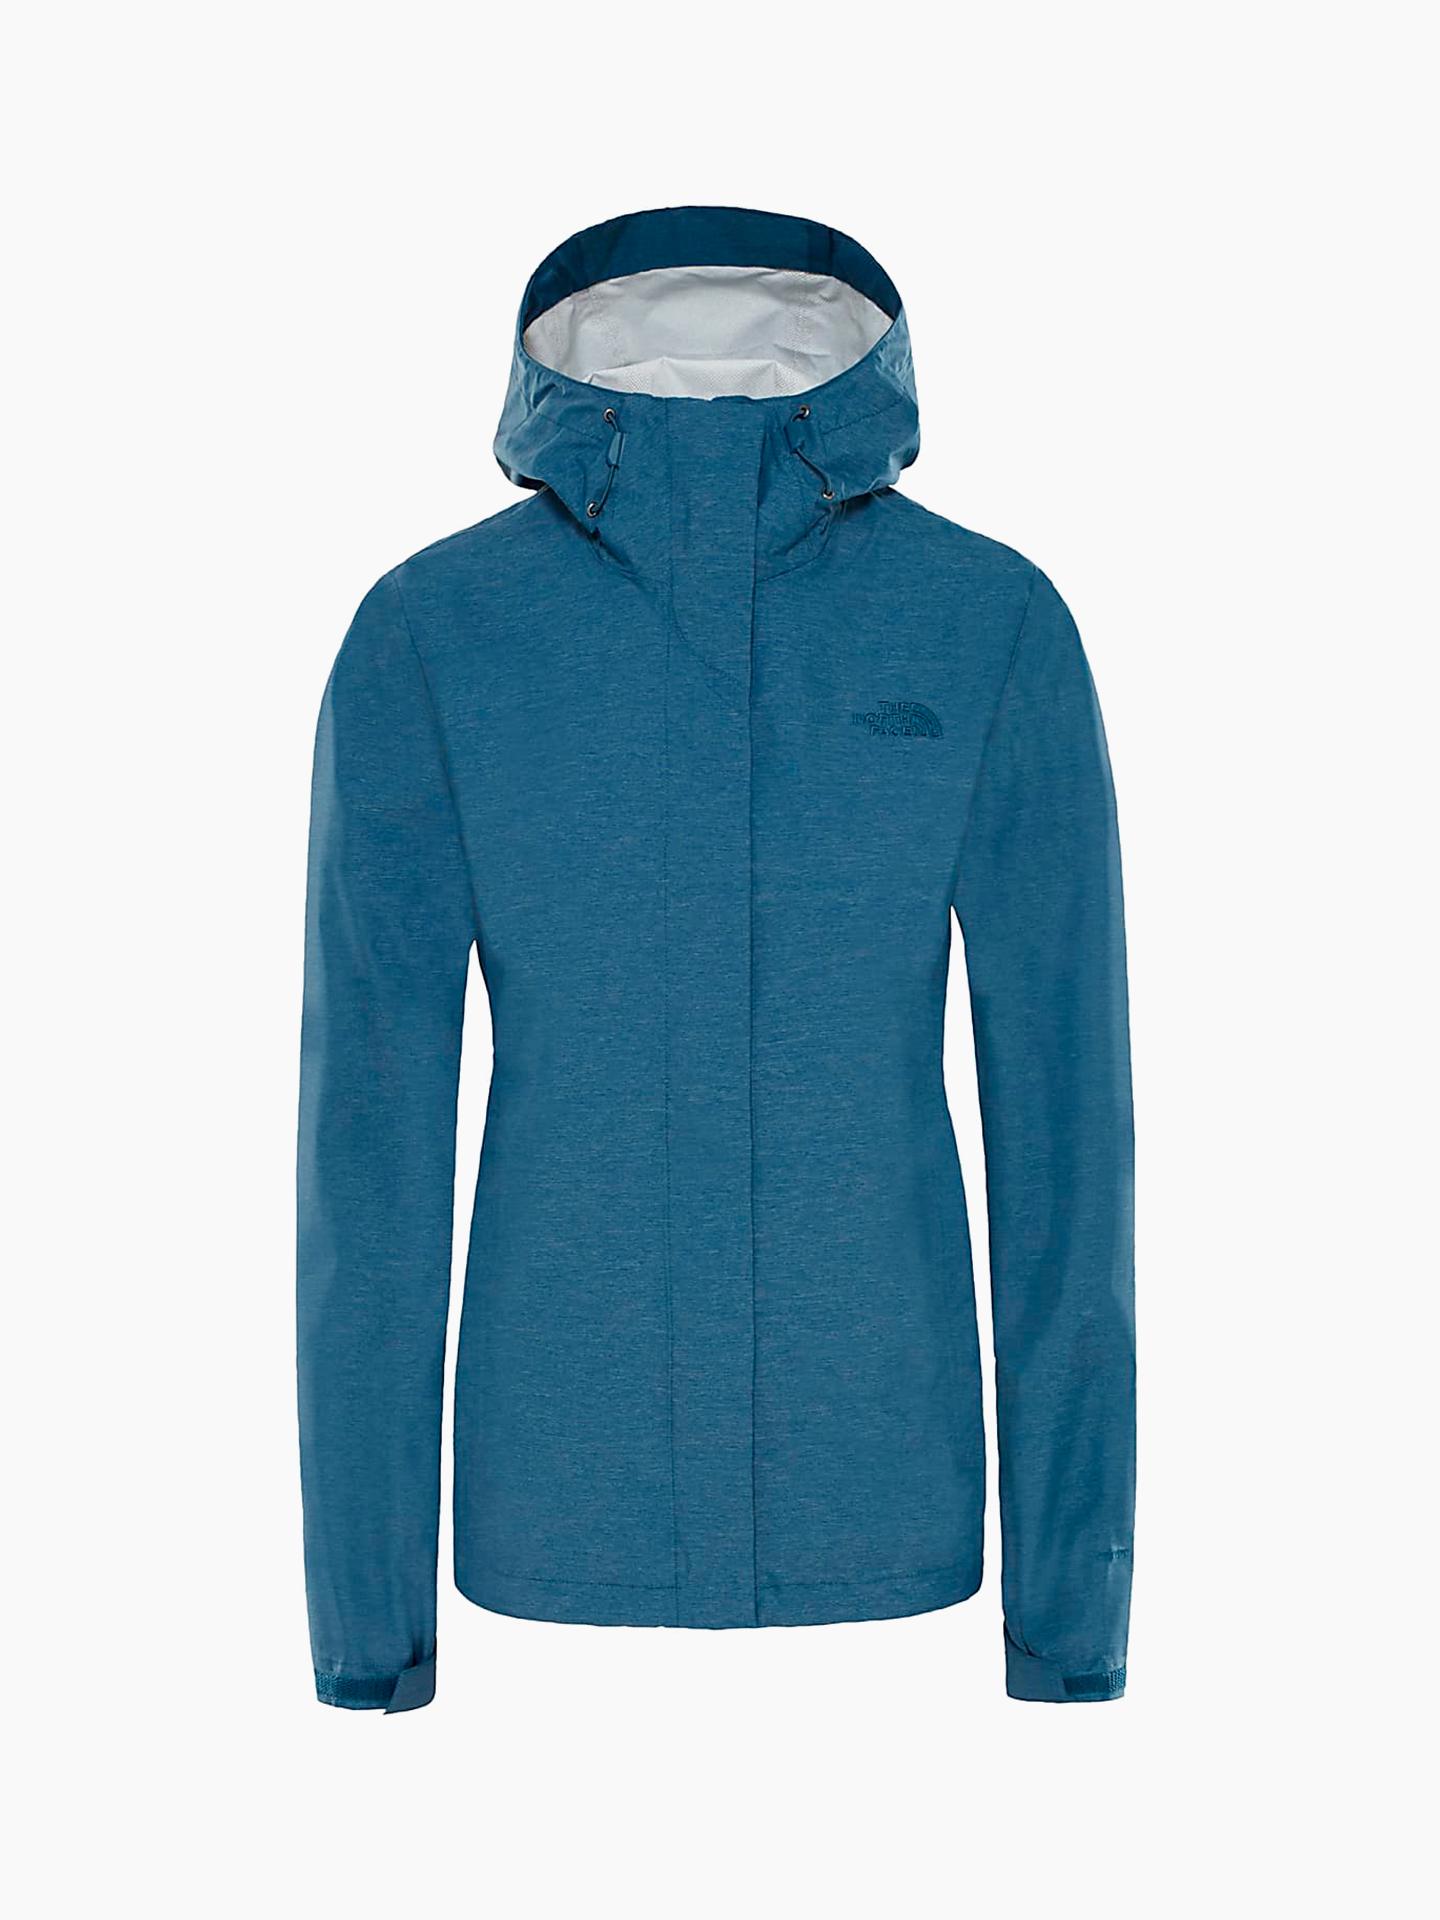 Женская куртка The North Face Venture 2